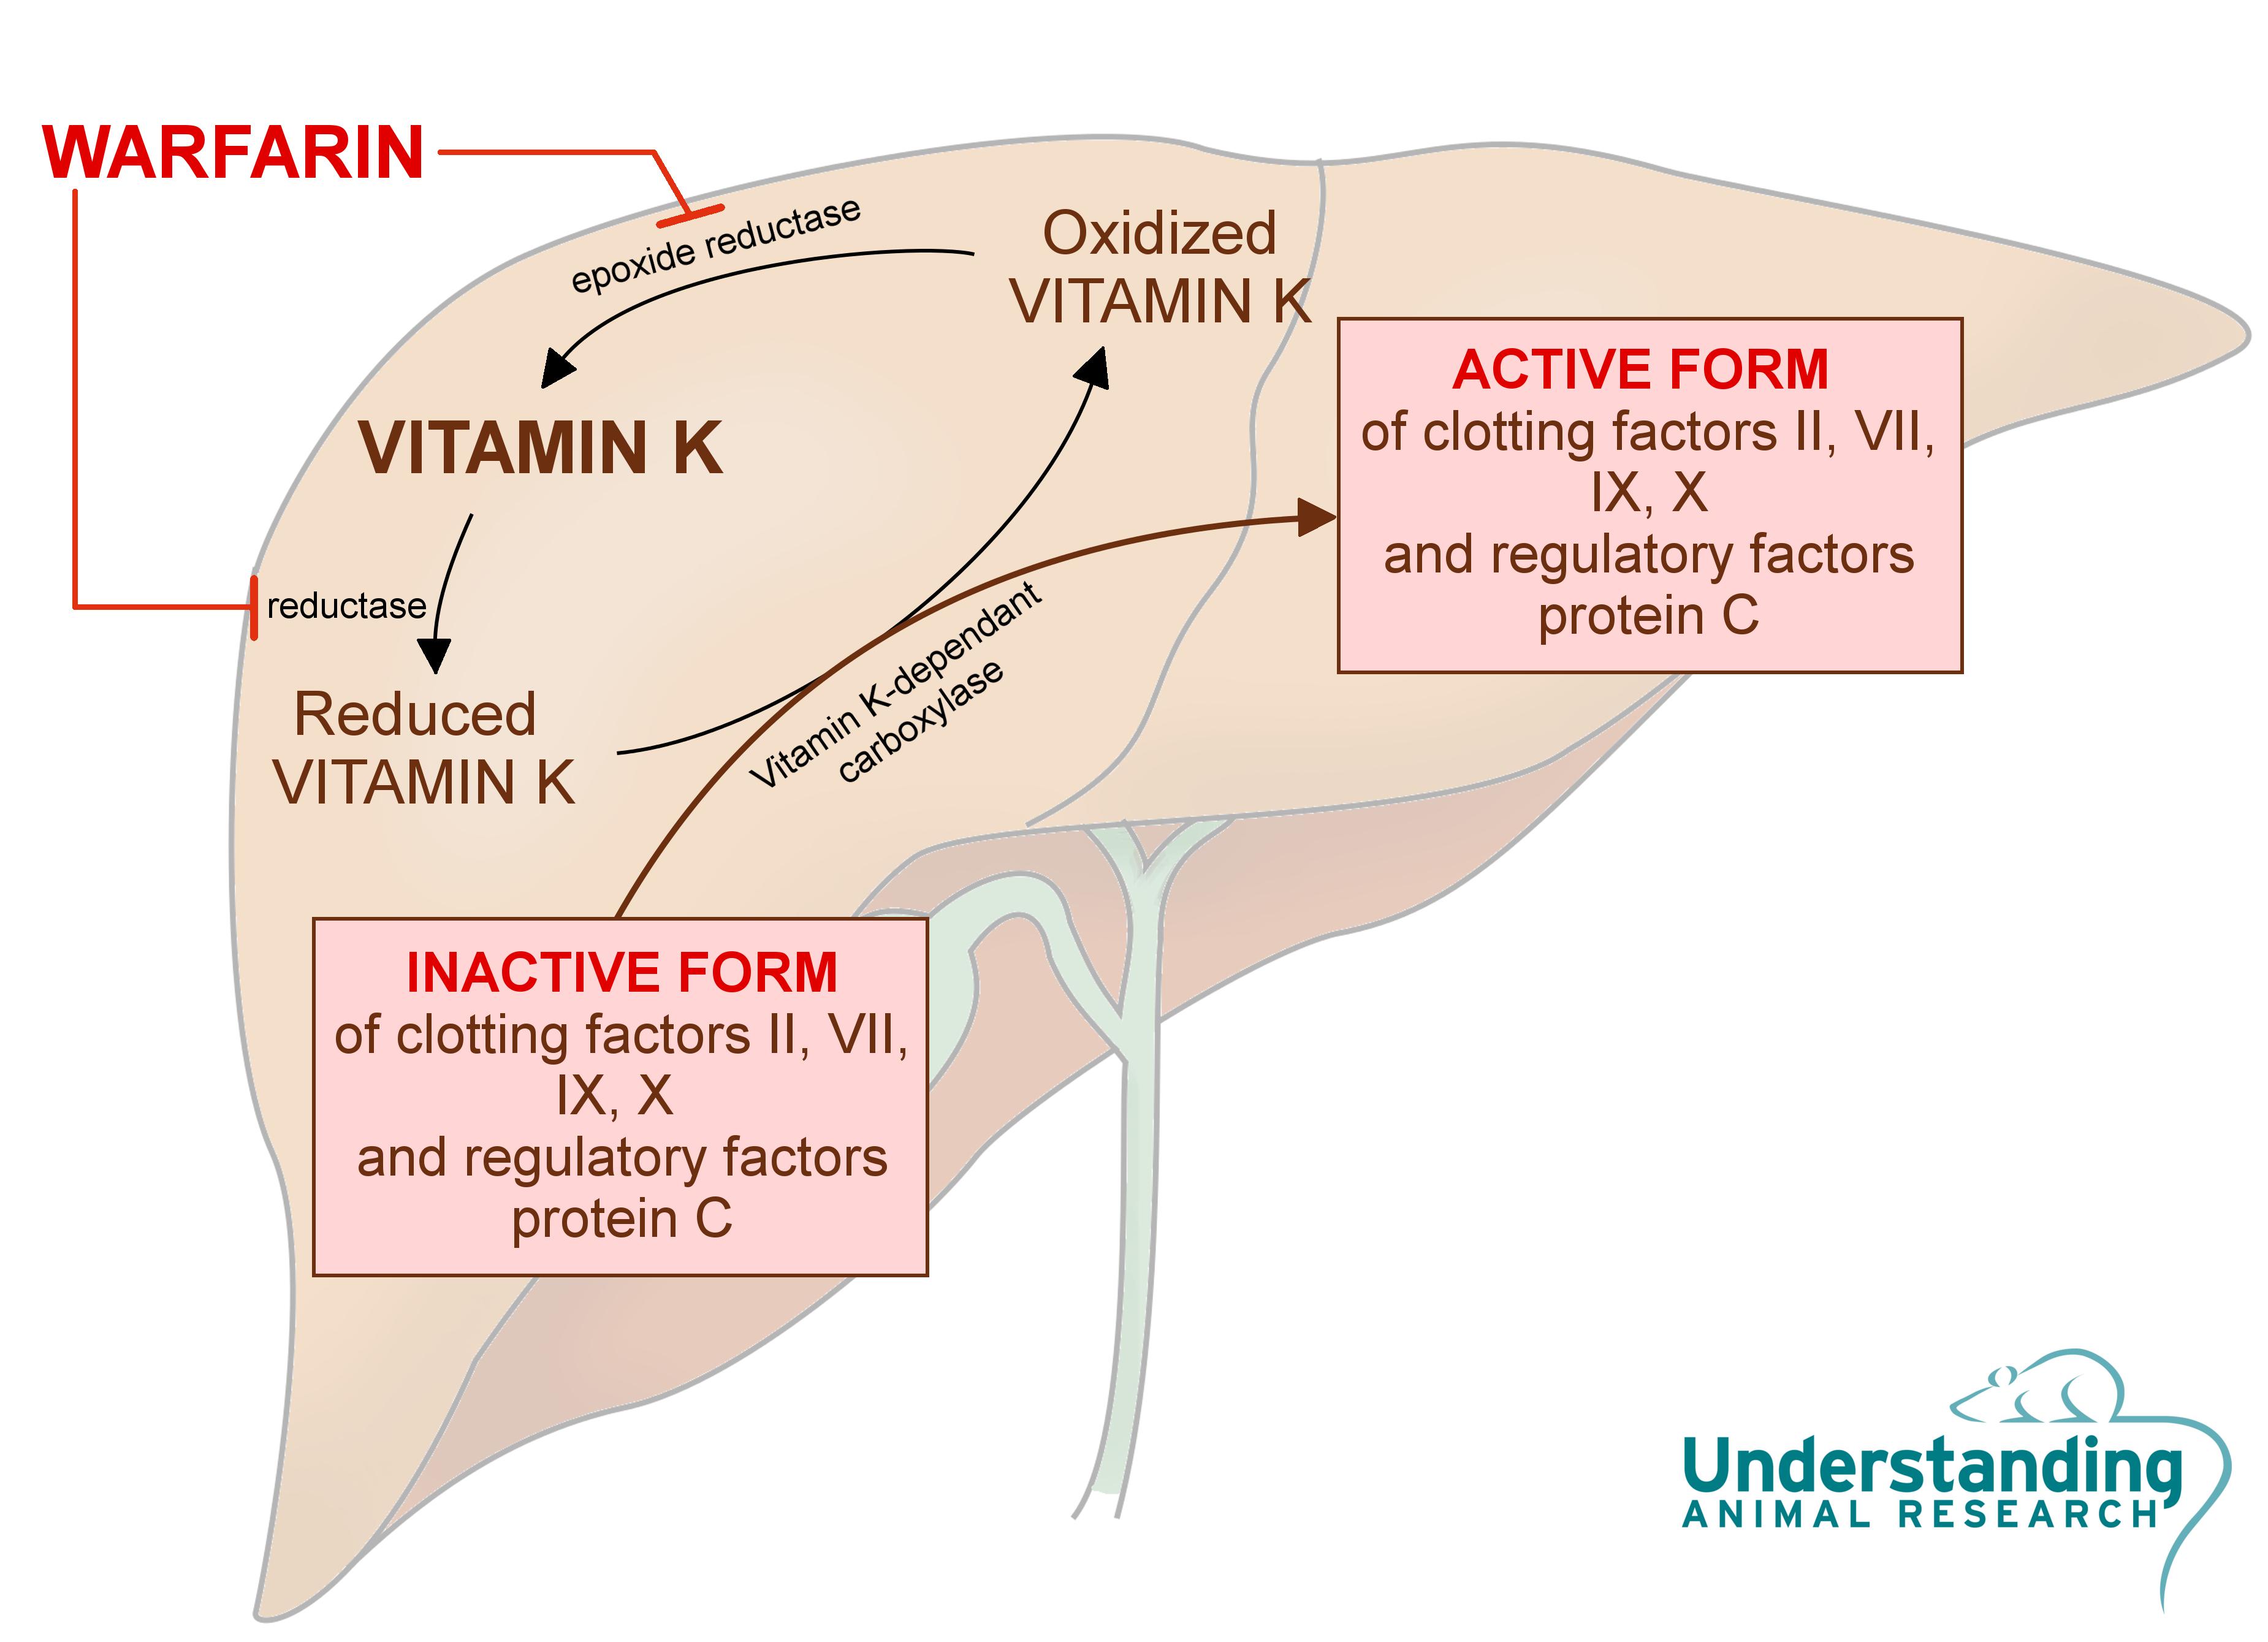 Fogyni, míg warfarin